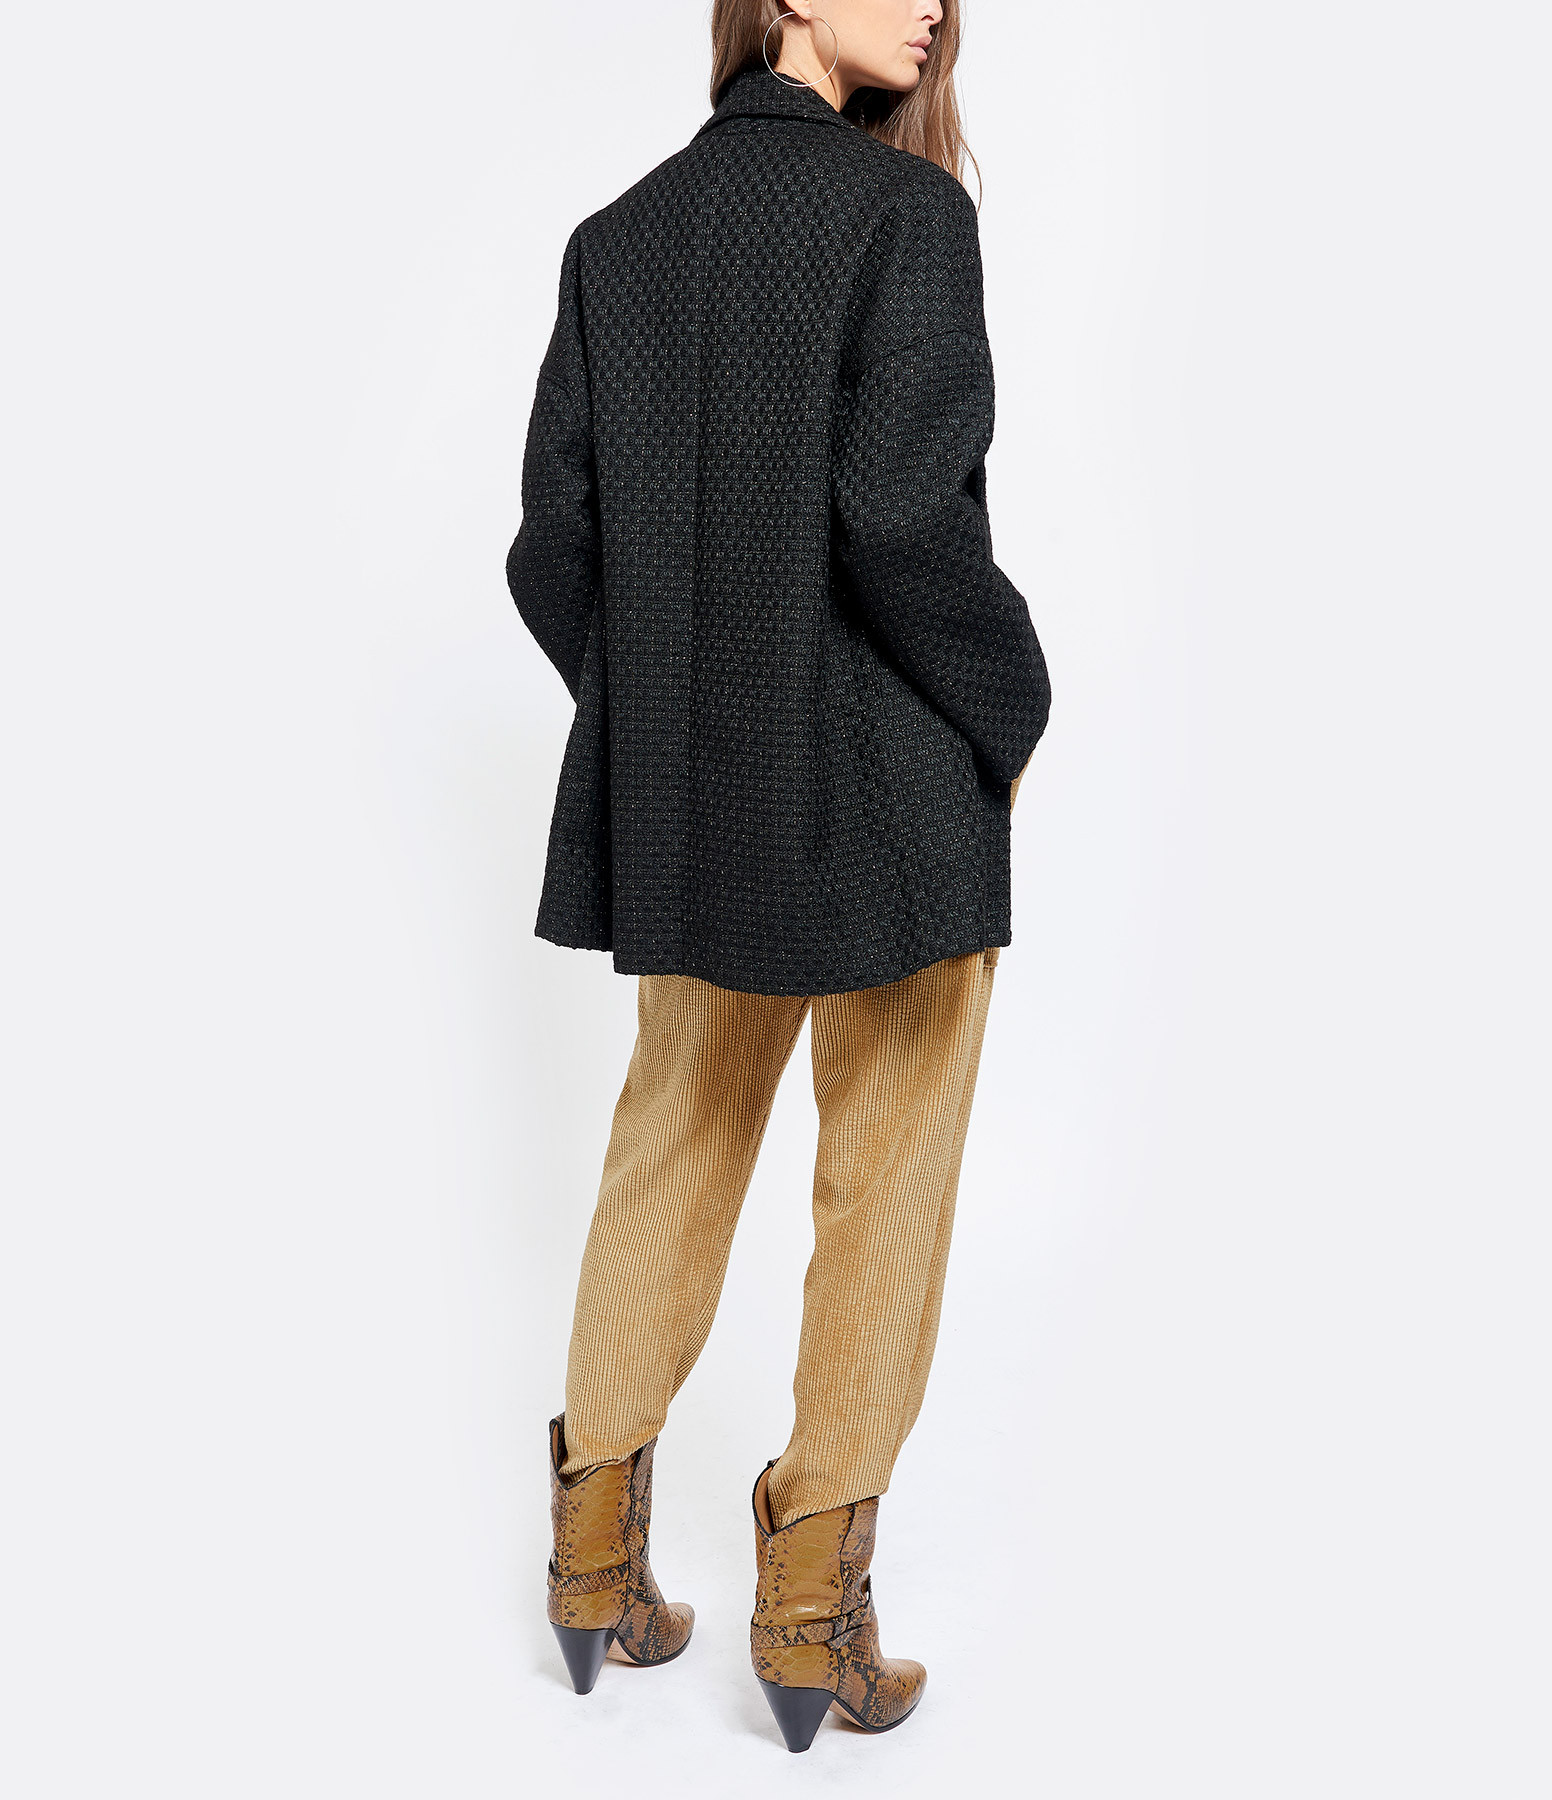 JEANNE VOULAND - Manteau Albe Tweed Lurex Noir